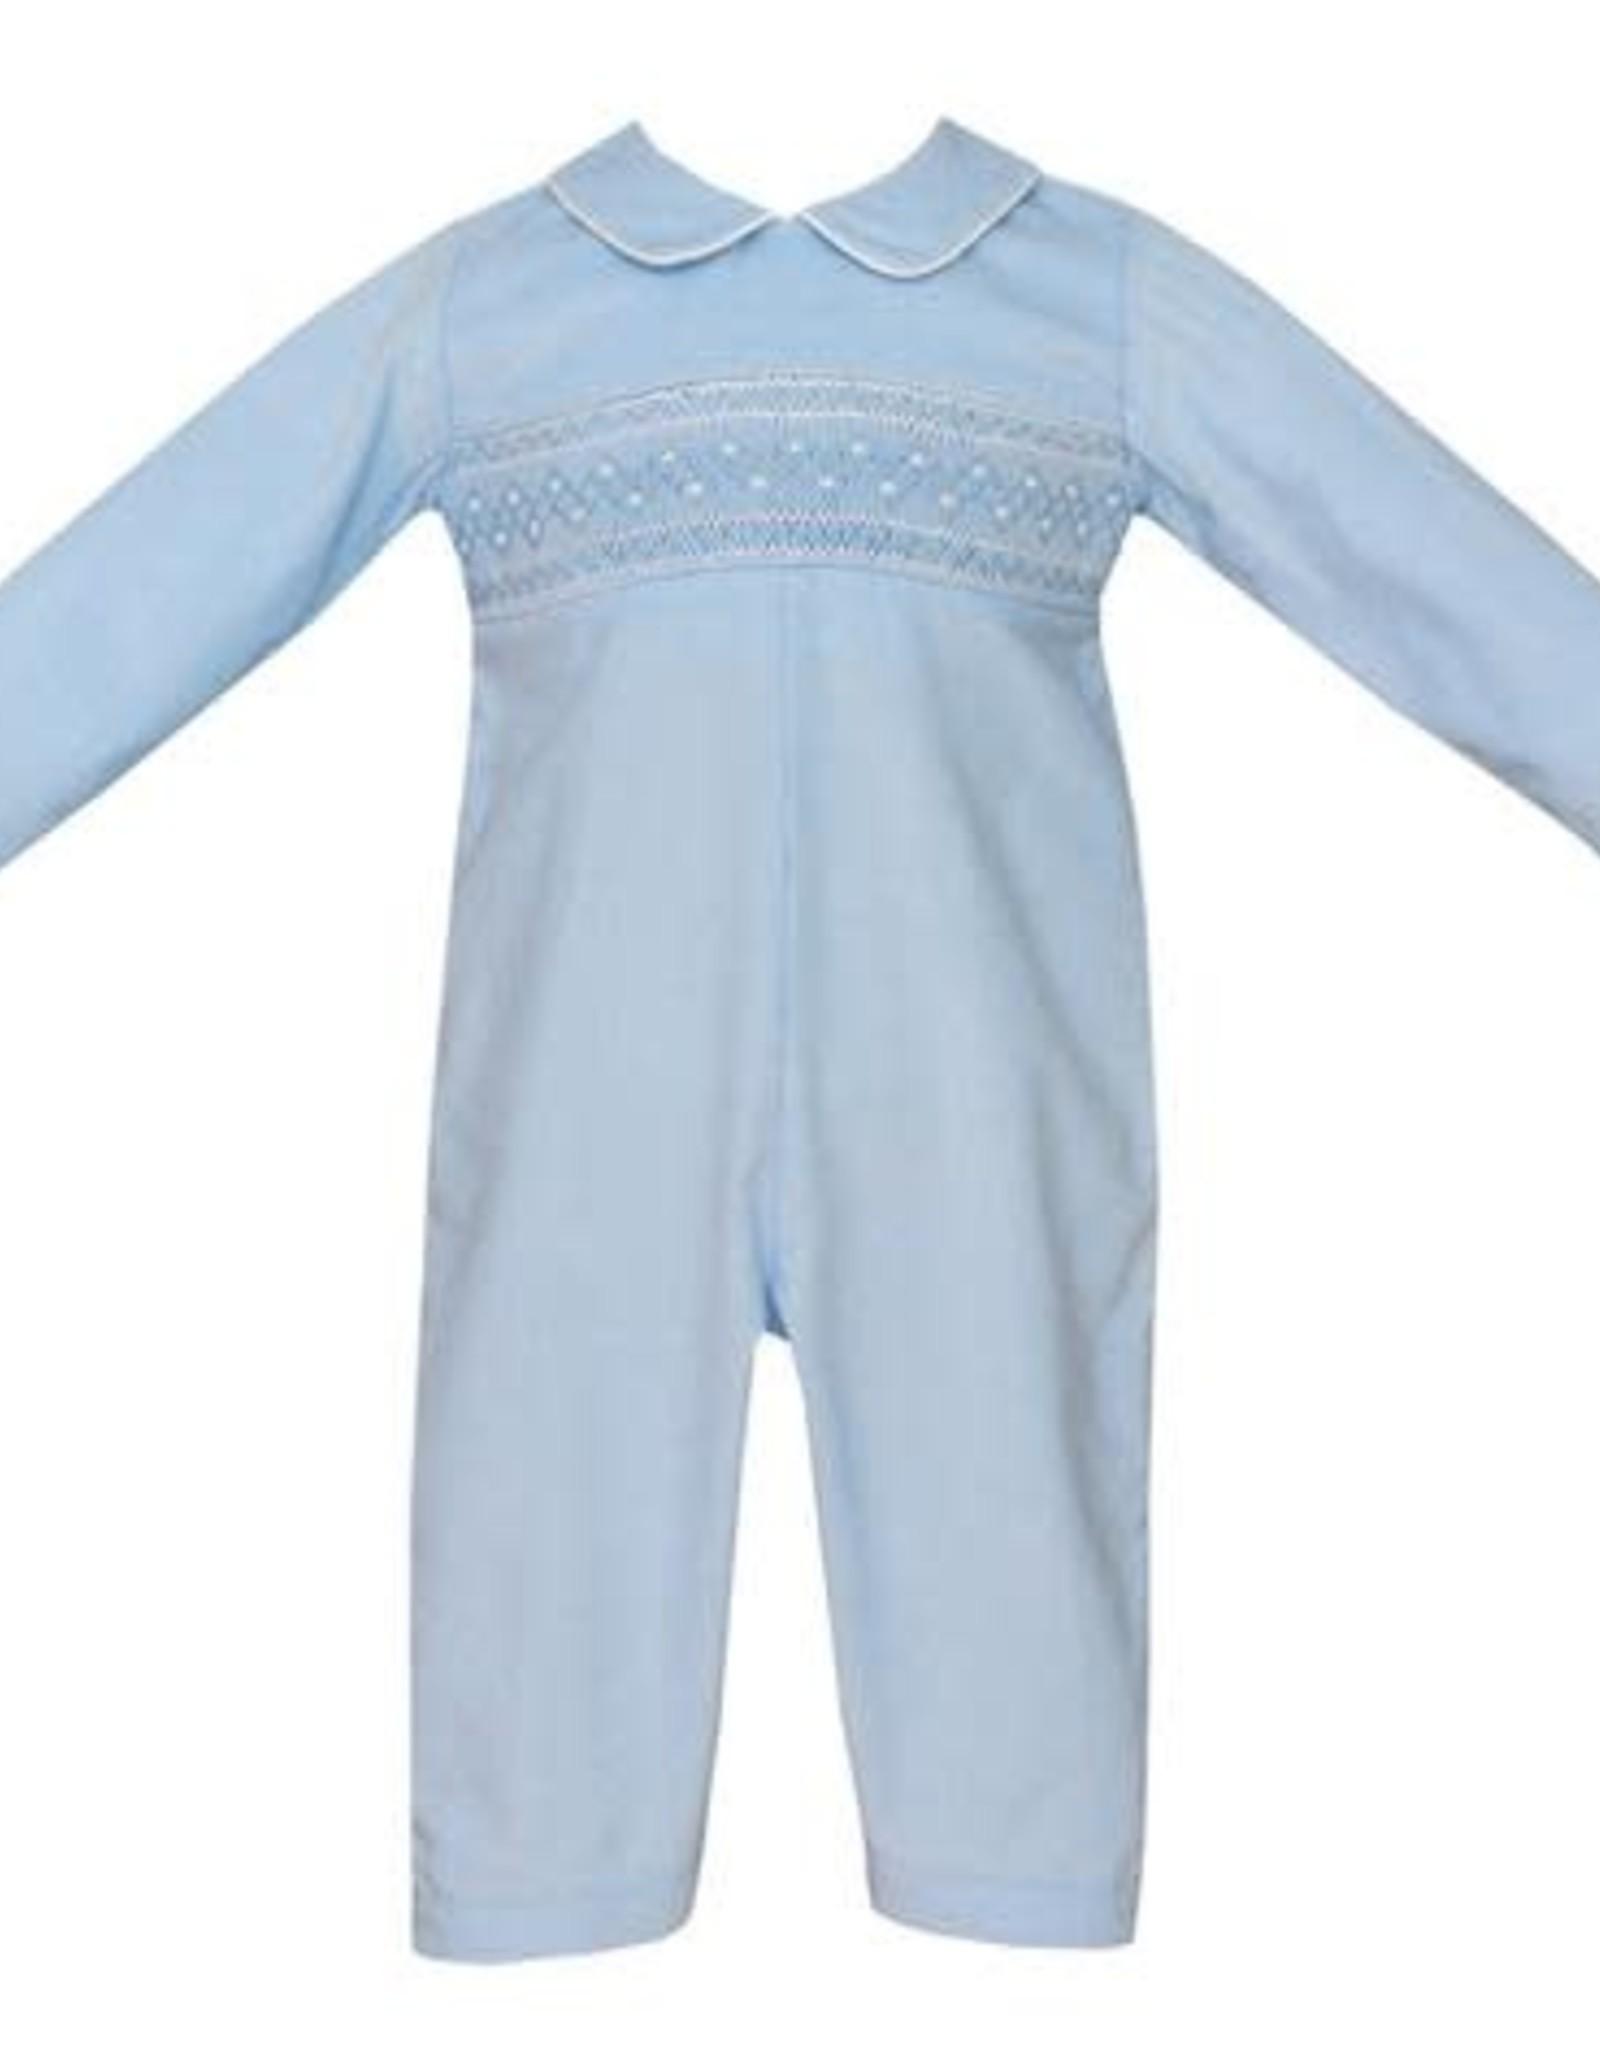 Petit Bebe Noah Boy's Long Bubble Light Blue Corduroy With White Smocking